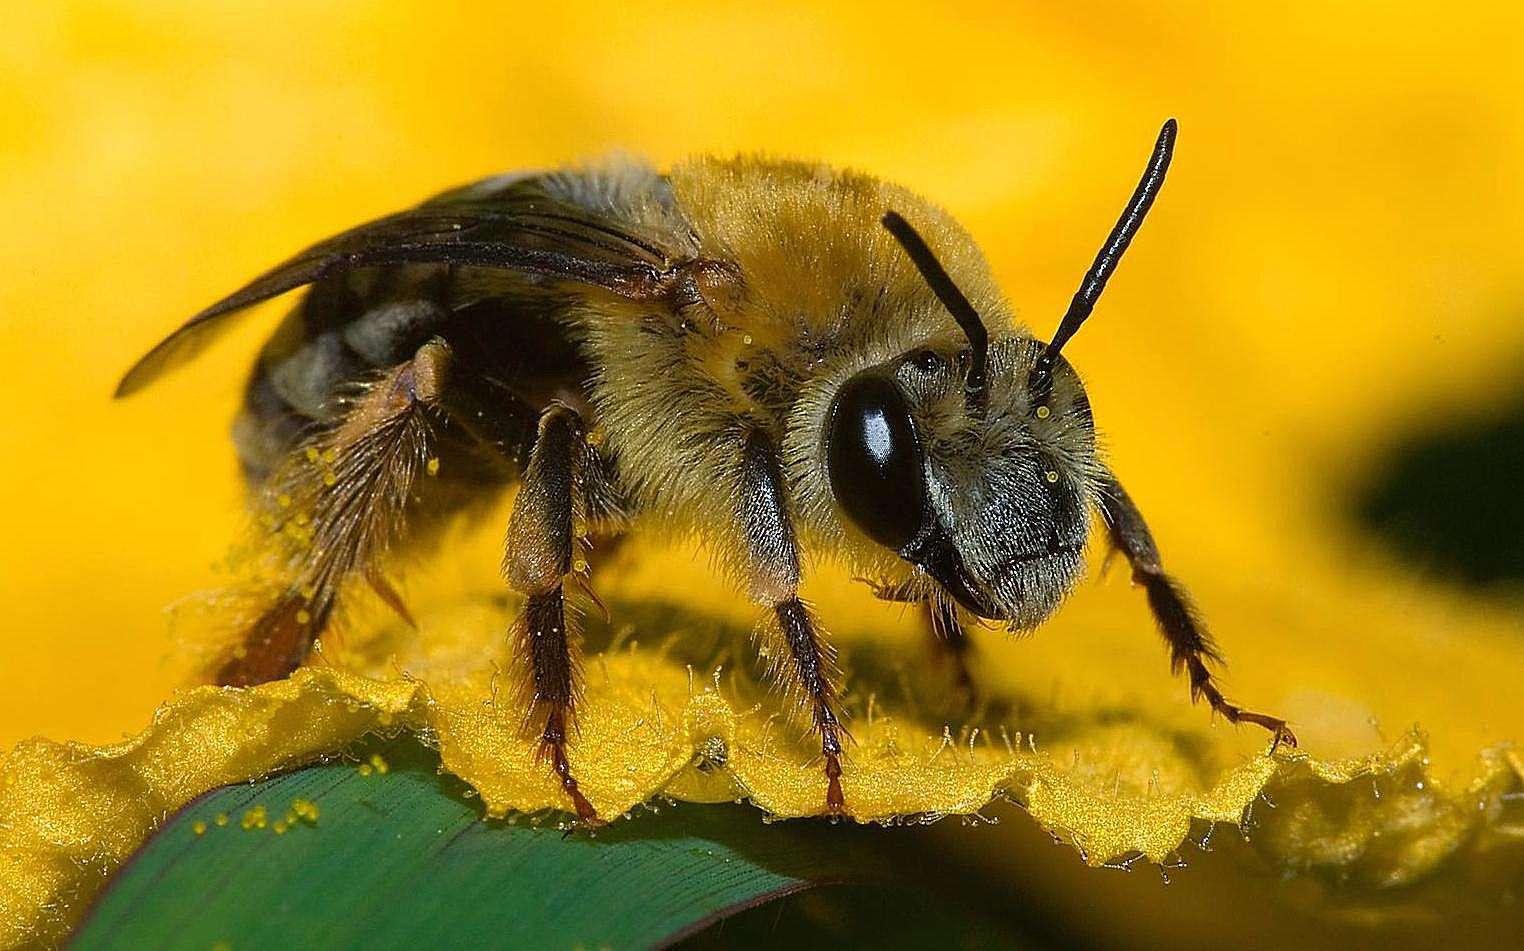 Squash bee.